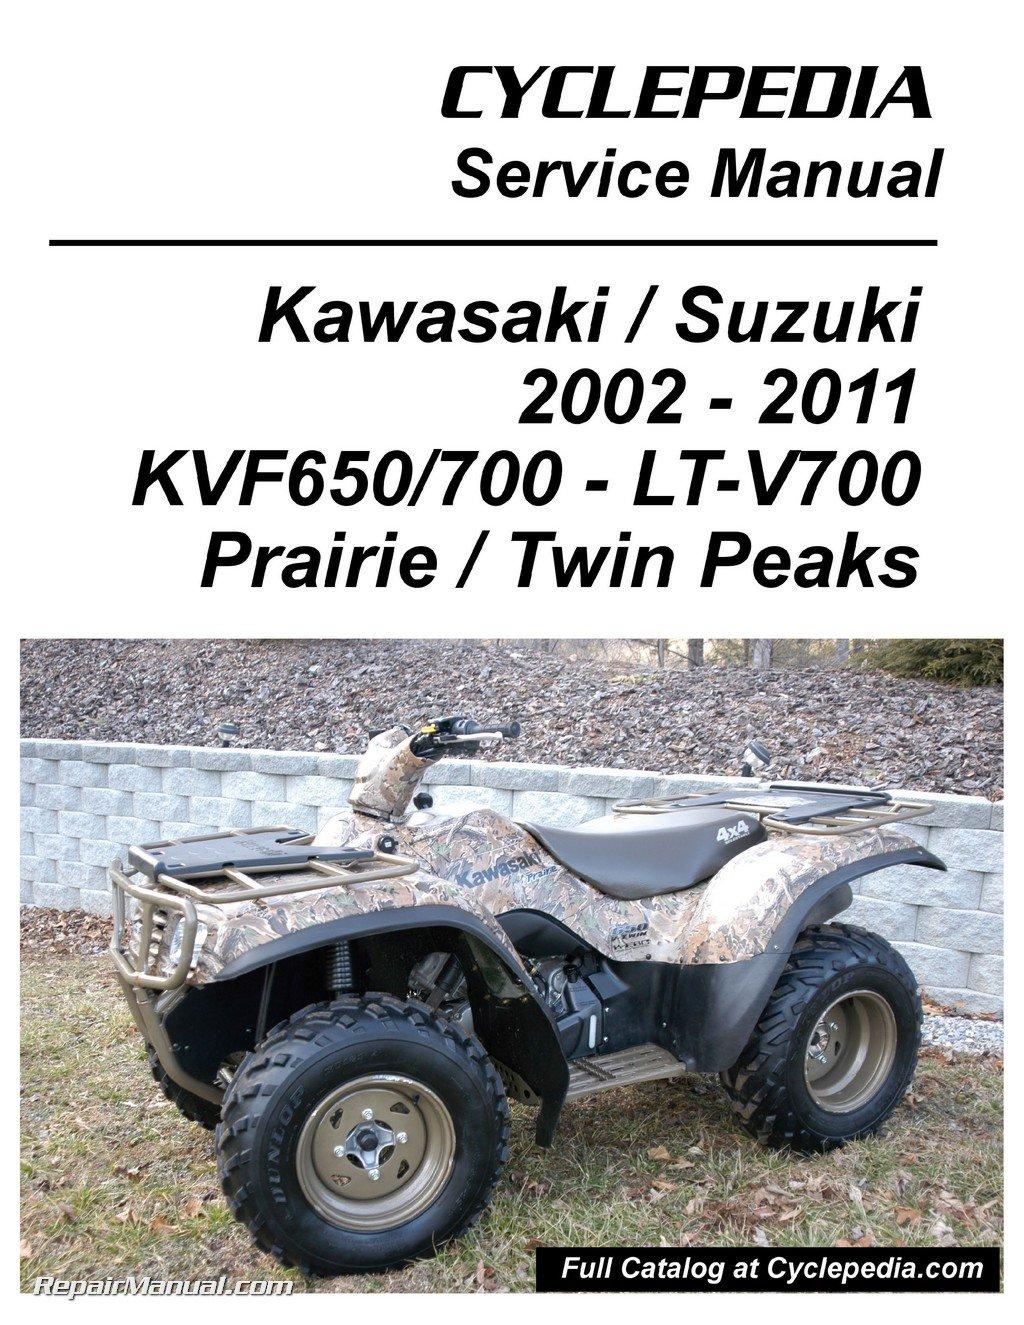 Cpp 153 P Kawasaki Kvf650 Brute Force Kvf650 Kvf700 Prairie Suzuki Twinpeaks 700 Atv Printed Service Manual By Author Amazon Com Books